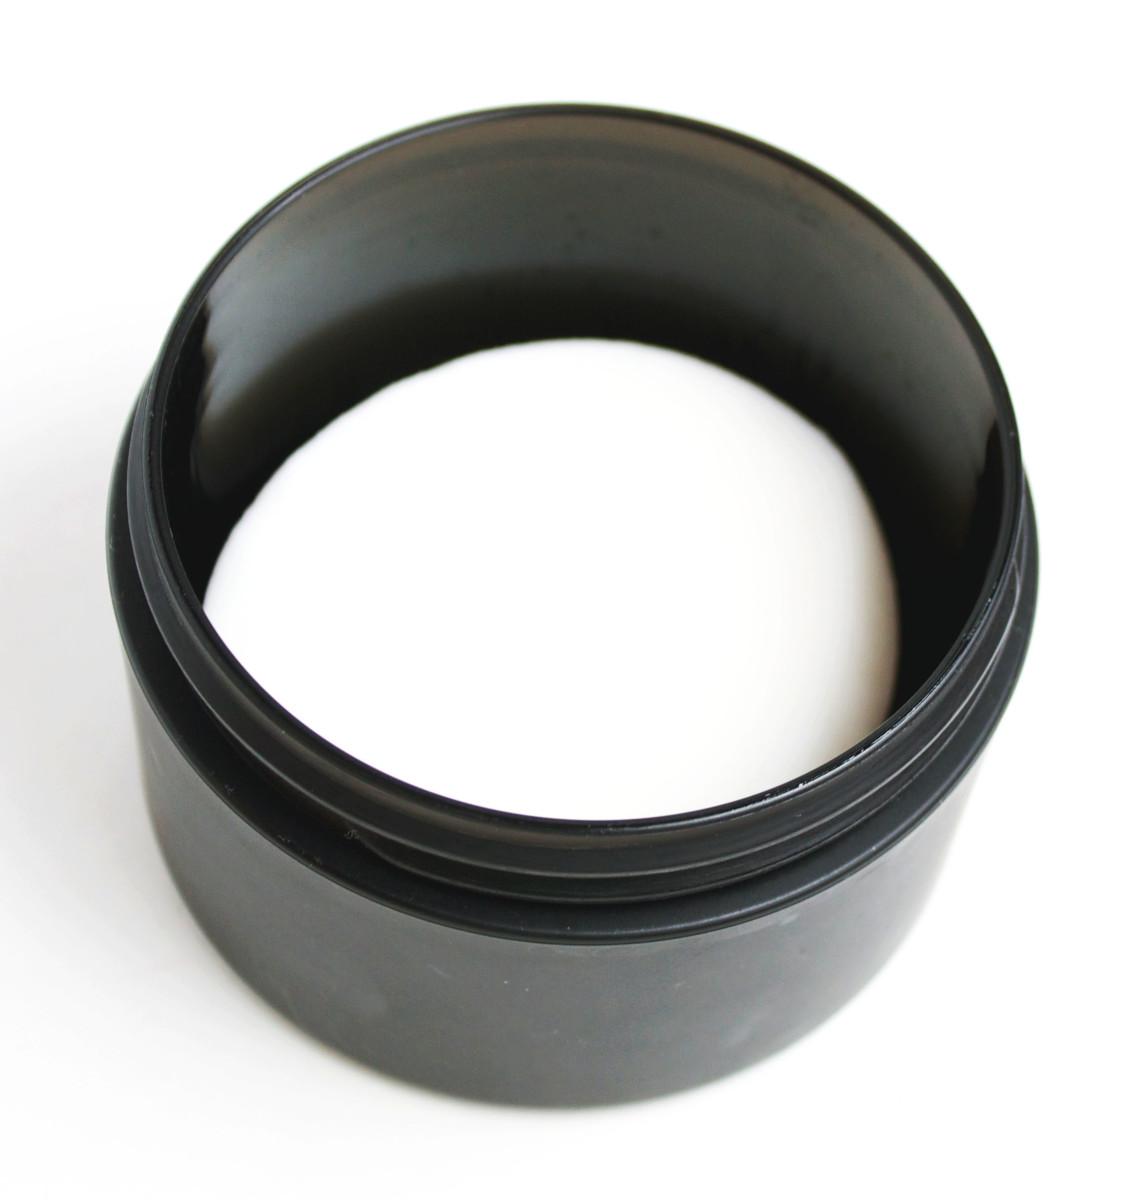 Rodial Glamoxy 15 Percent Fruit Acid Exfoliating Pads (open)